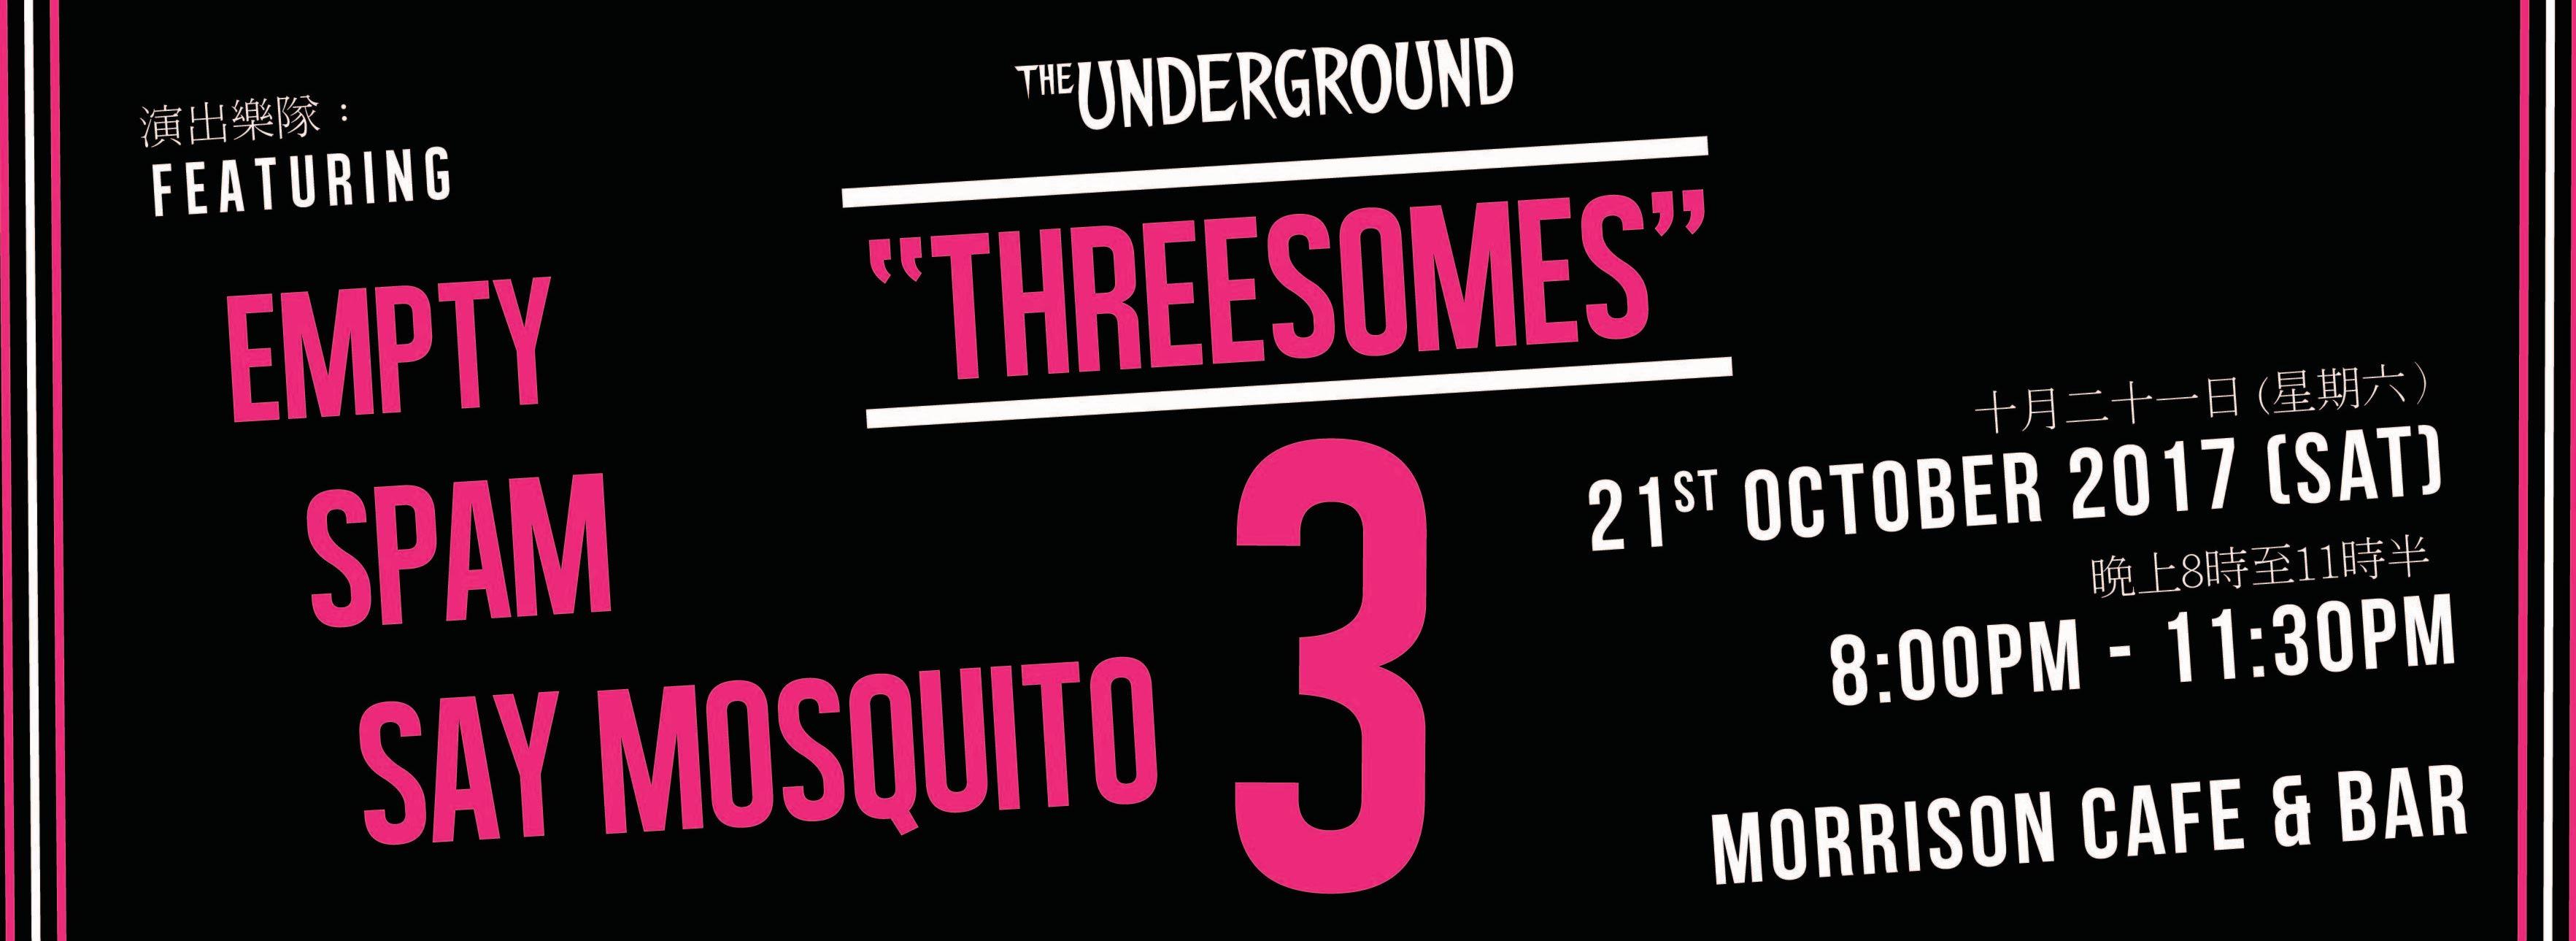 Underground Threesomes